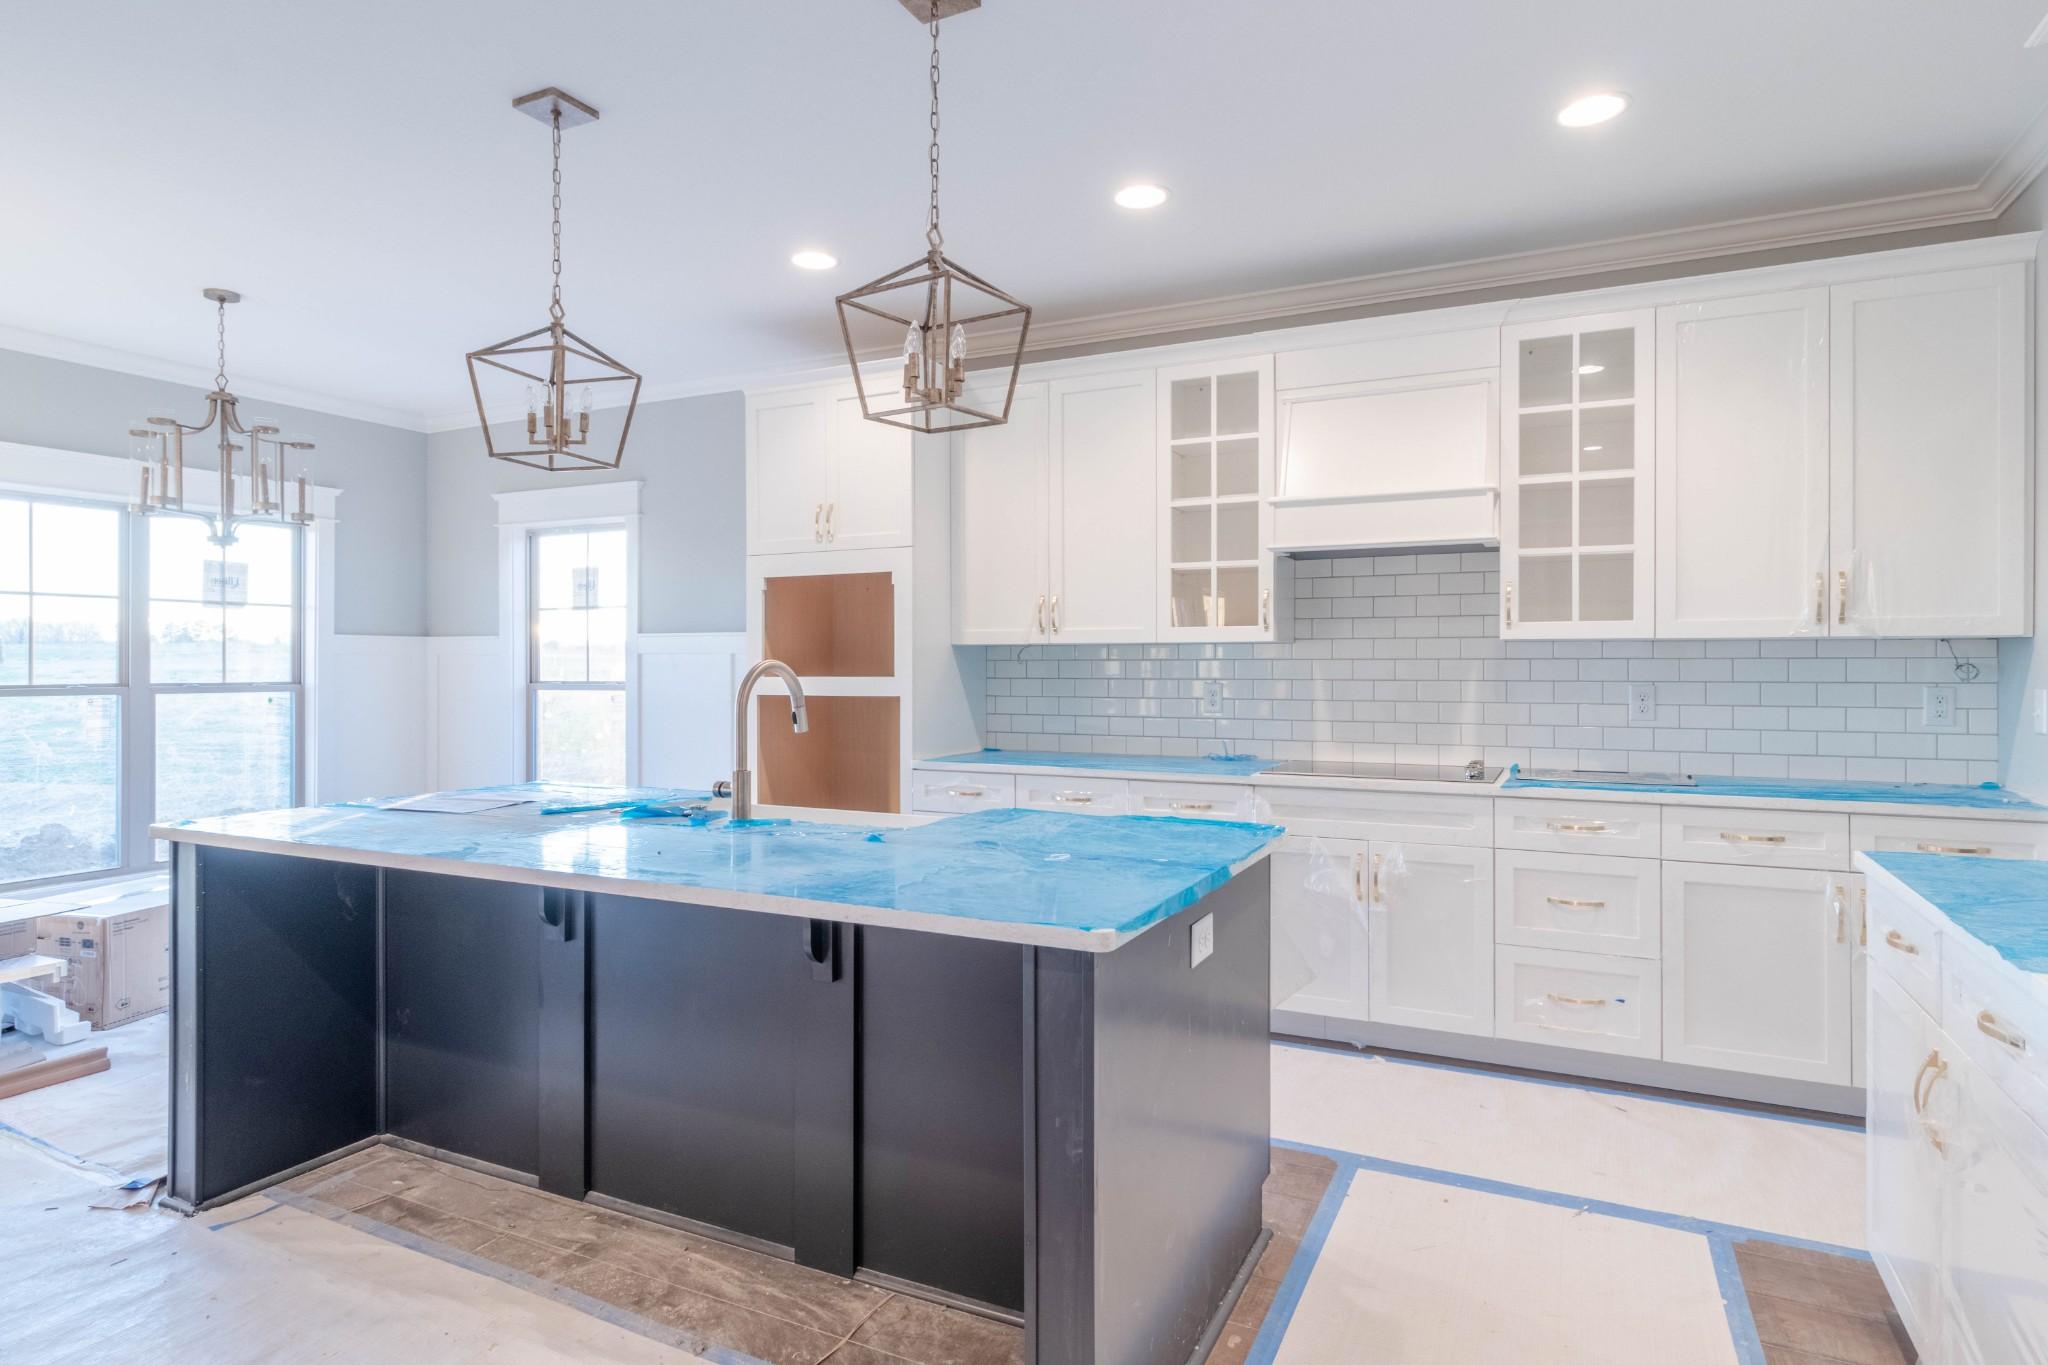 4476 Albright Rd, Clarksville, TN 37043 - Clarksville, TN real estate listing